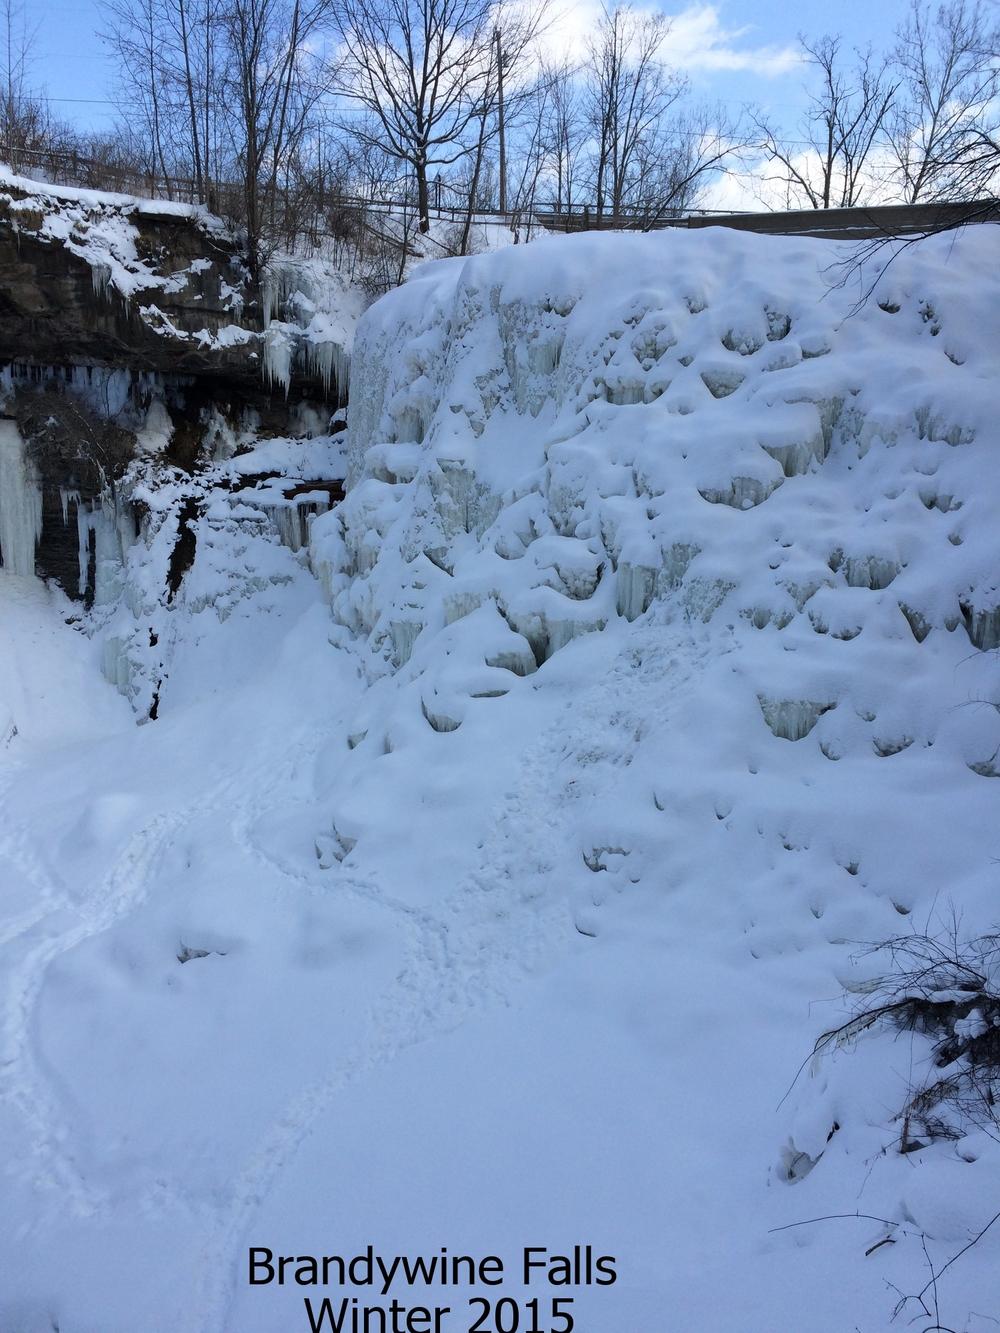 Brandywine Falls Winter 2015.JPG